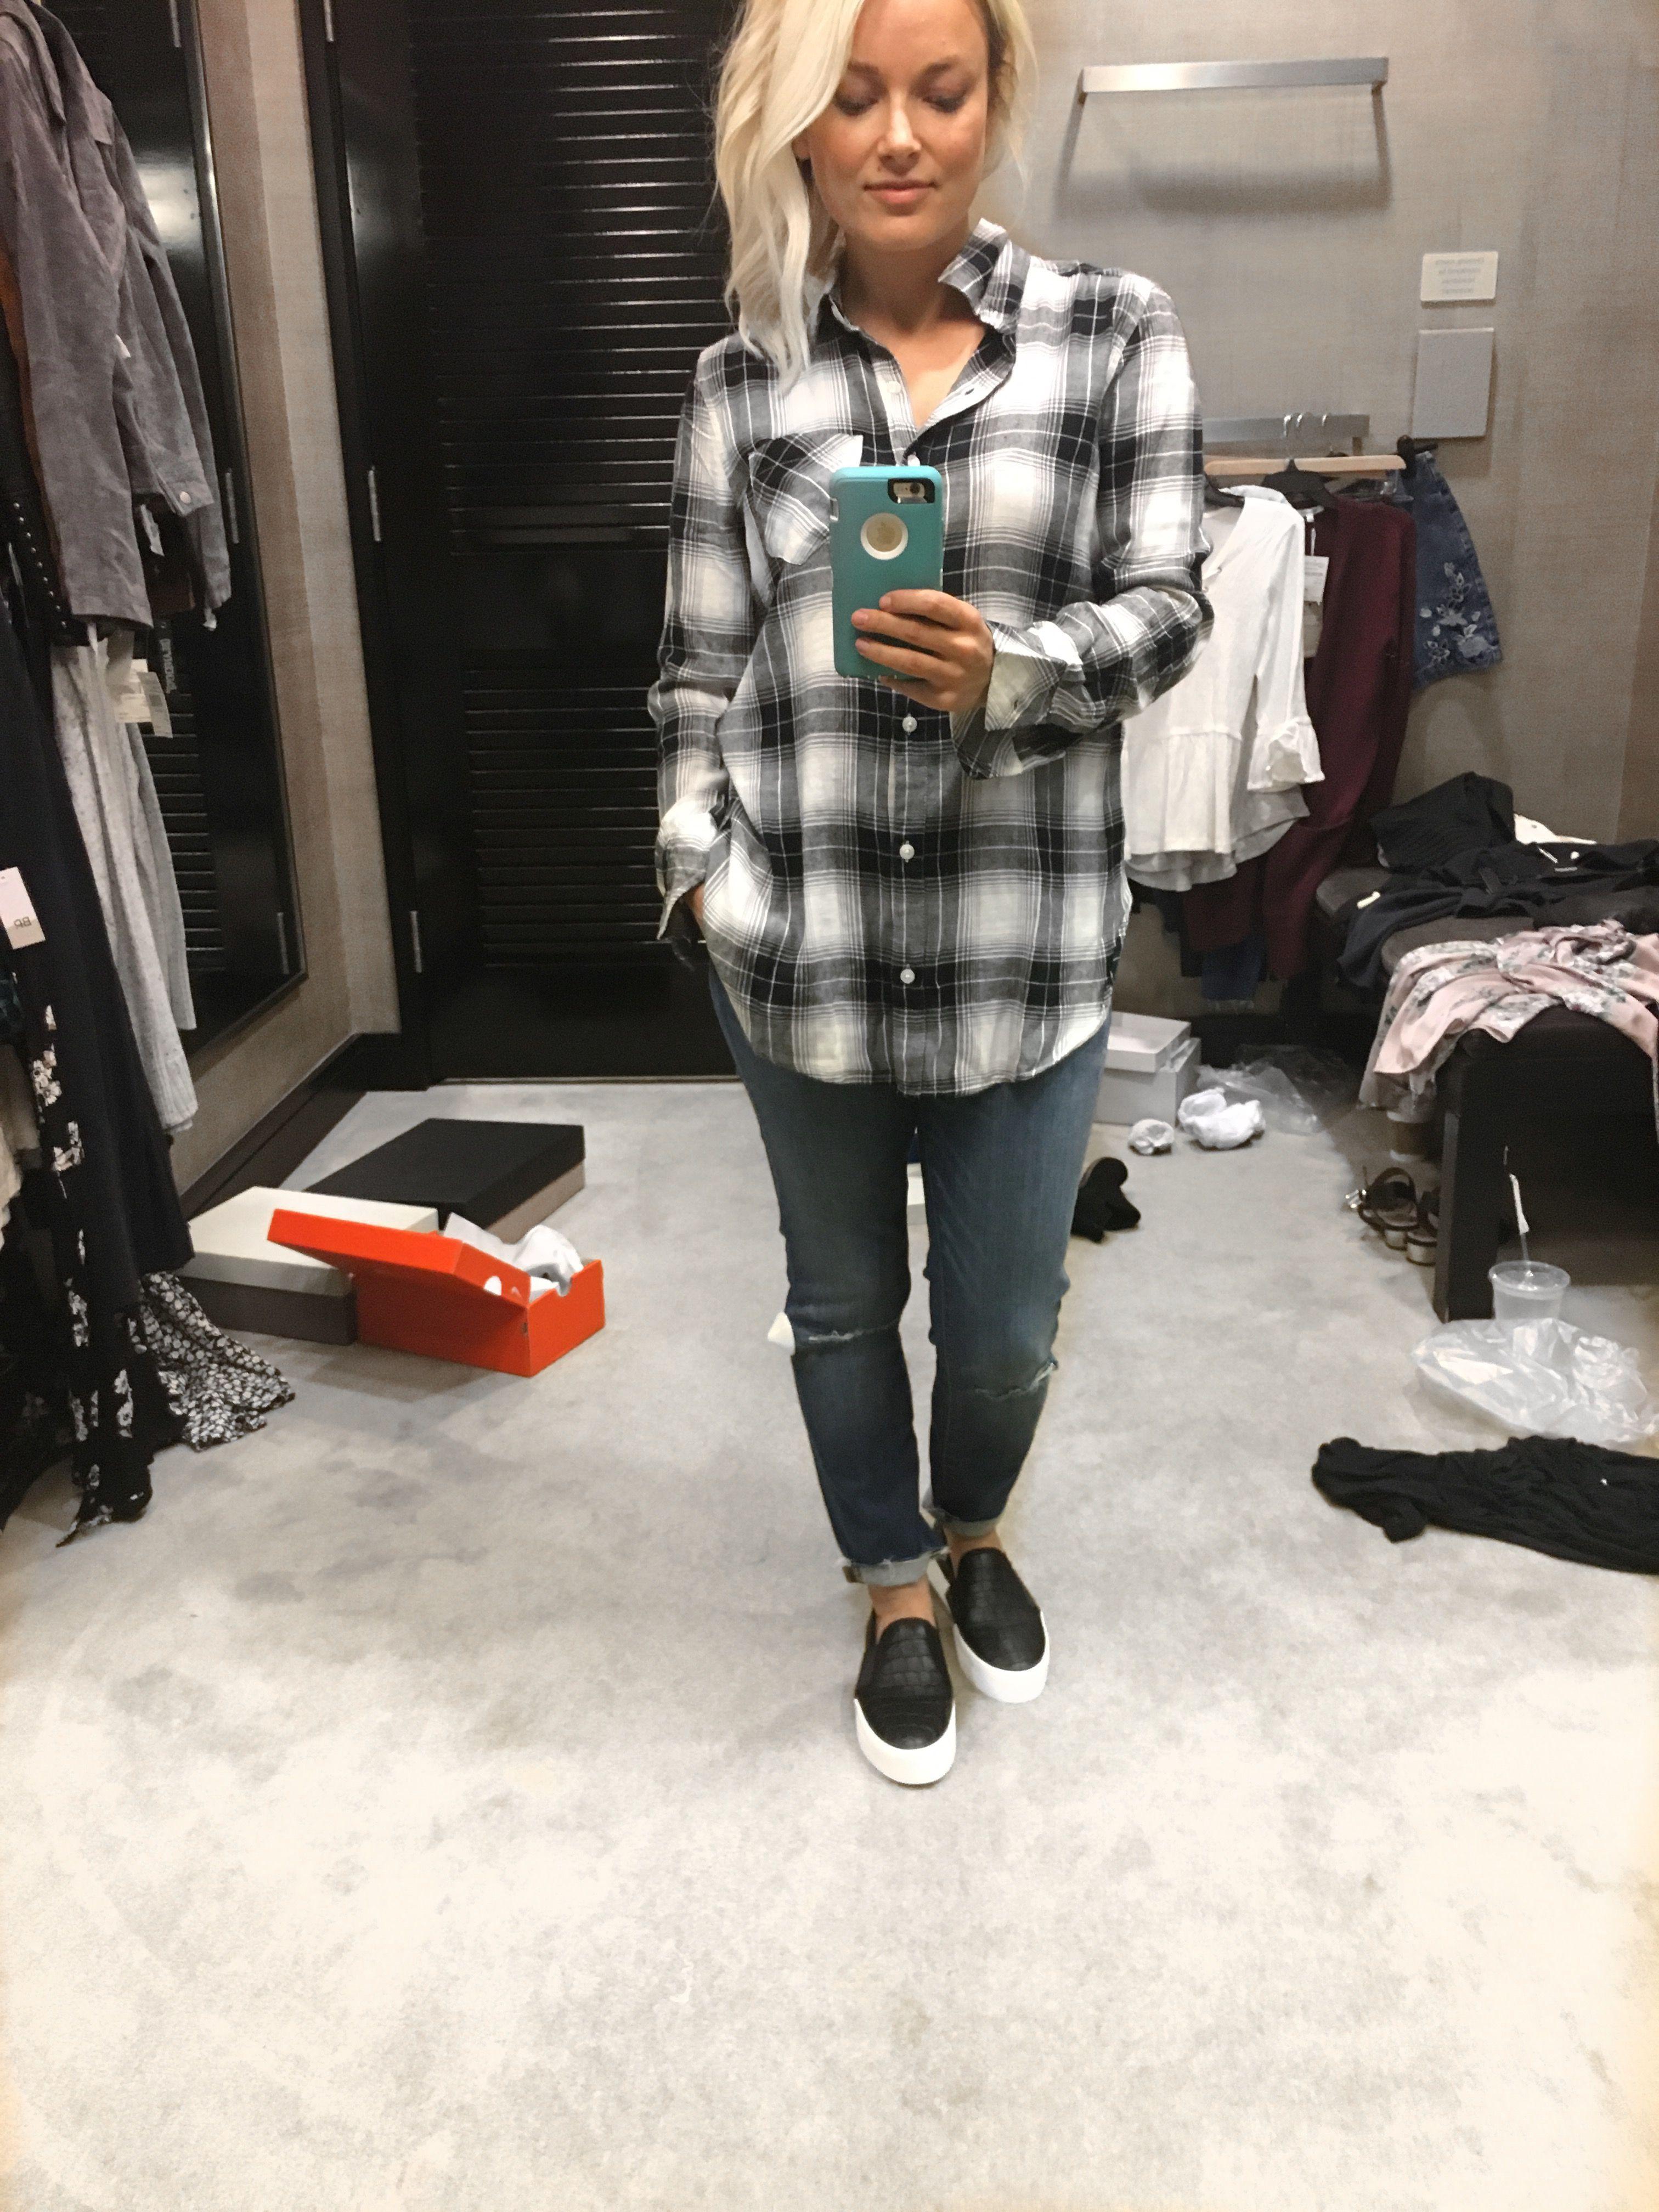 bc80e0ce2aa4 Nordstrom Anniversary Sale 2017 plaid long sleeve shirt